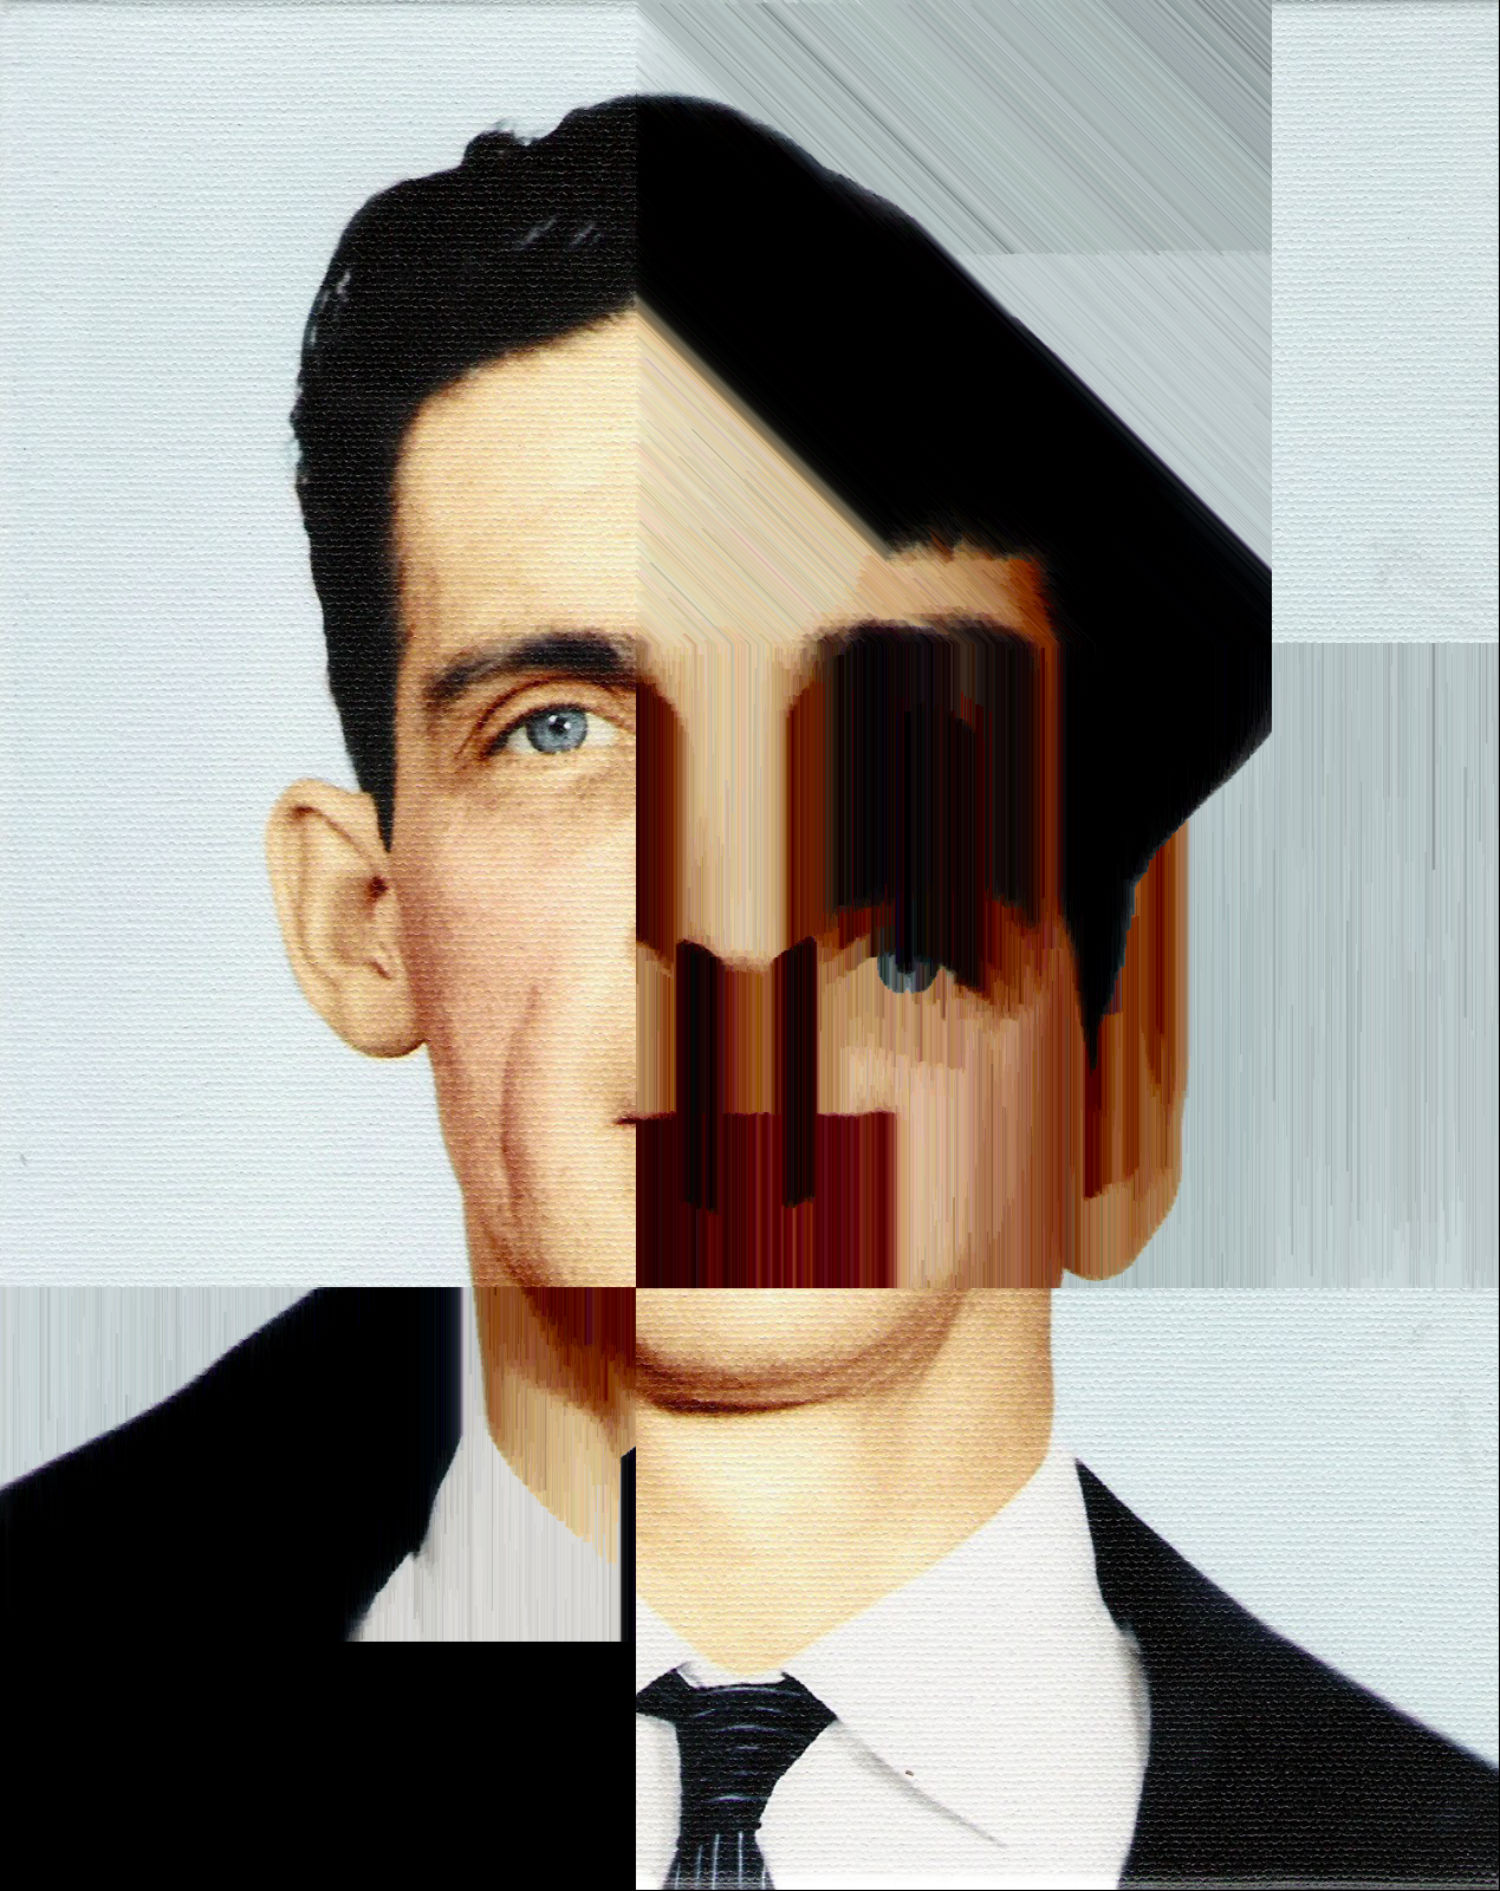 david szauder portrait digital